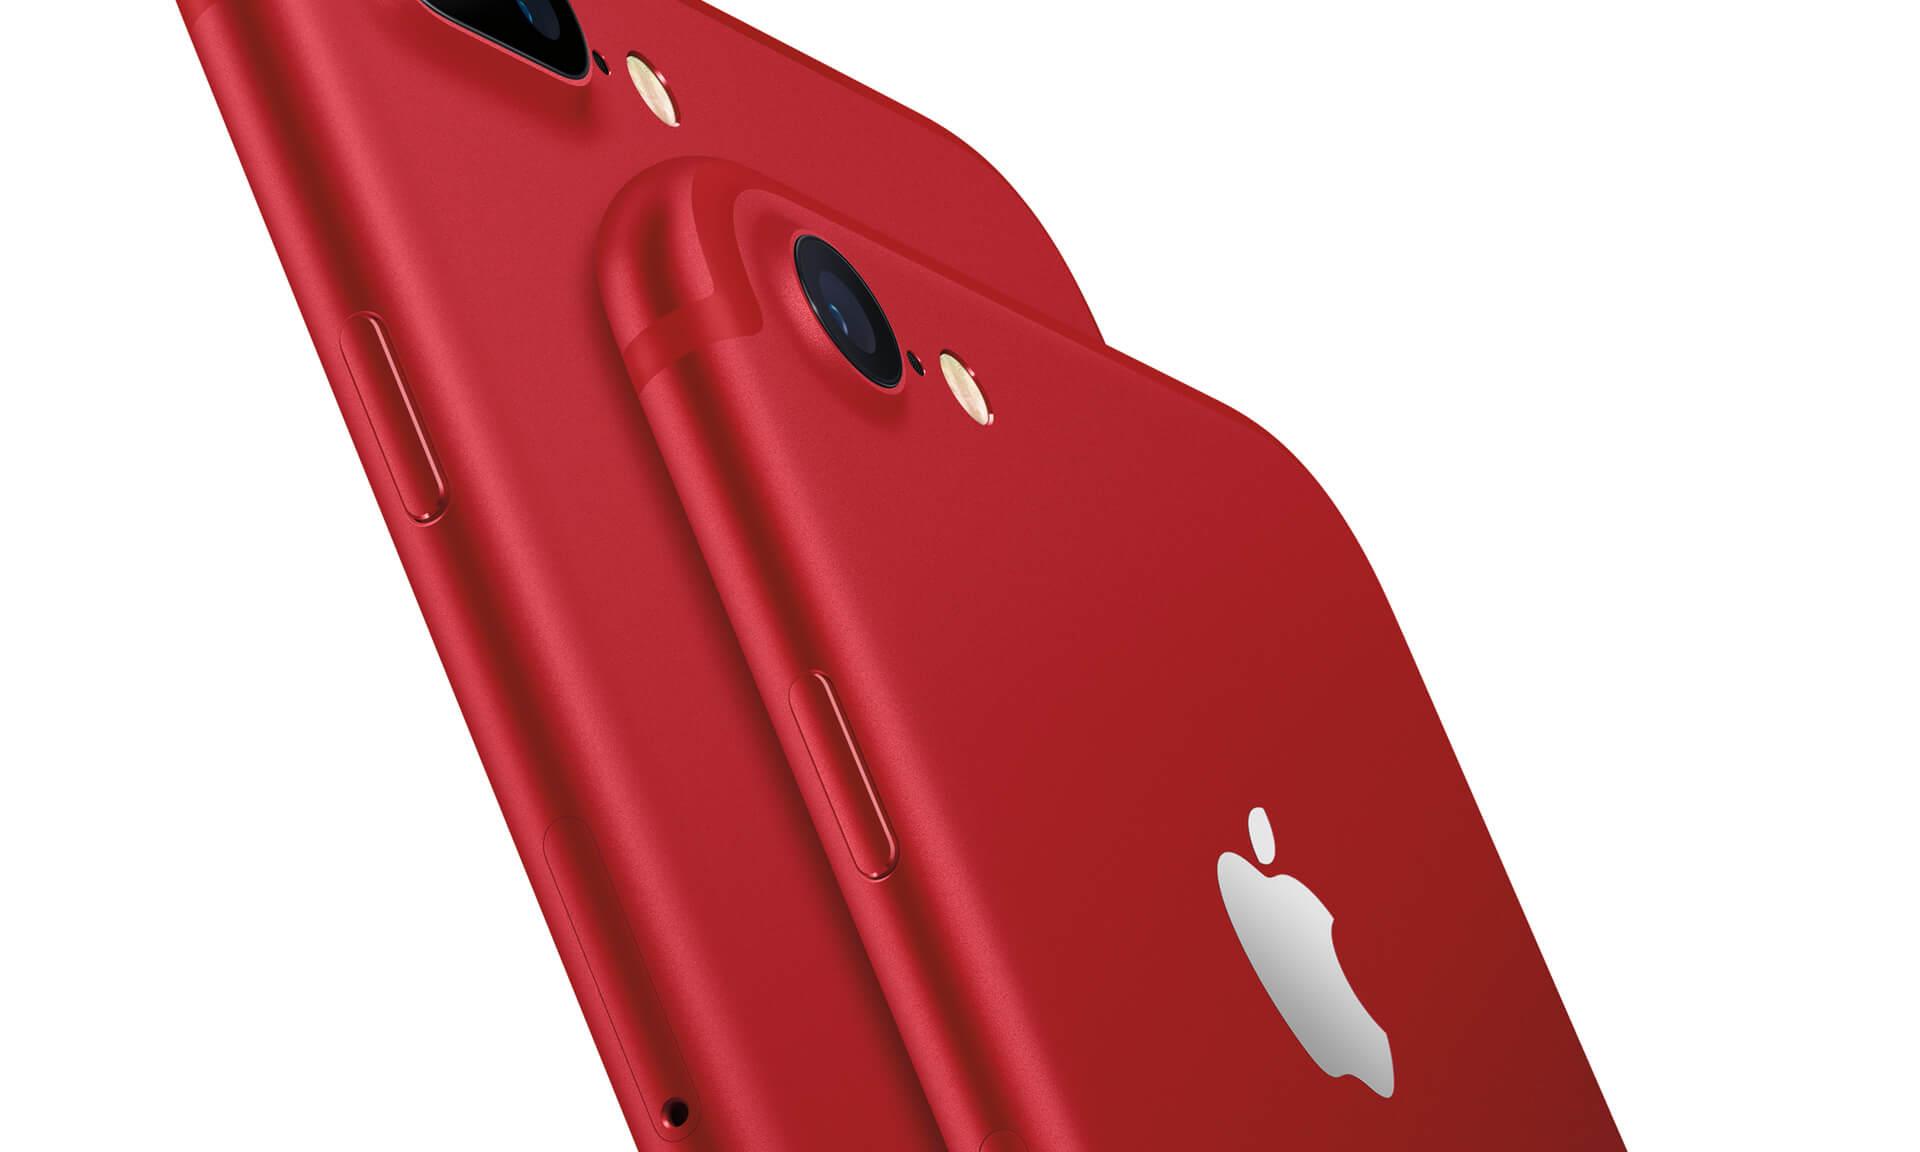 iphone red edition tutorials